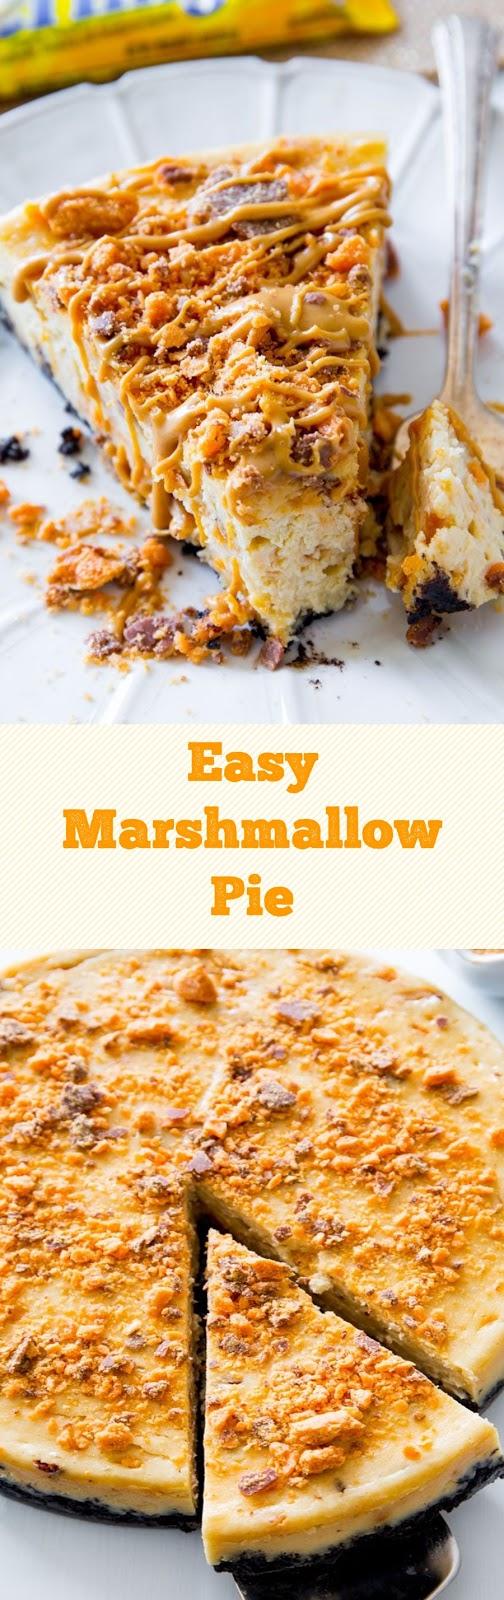 Easy Marshmallow Pie